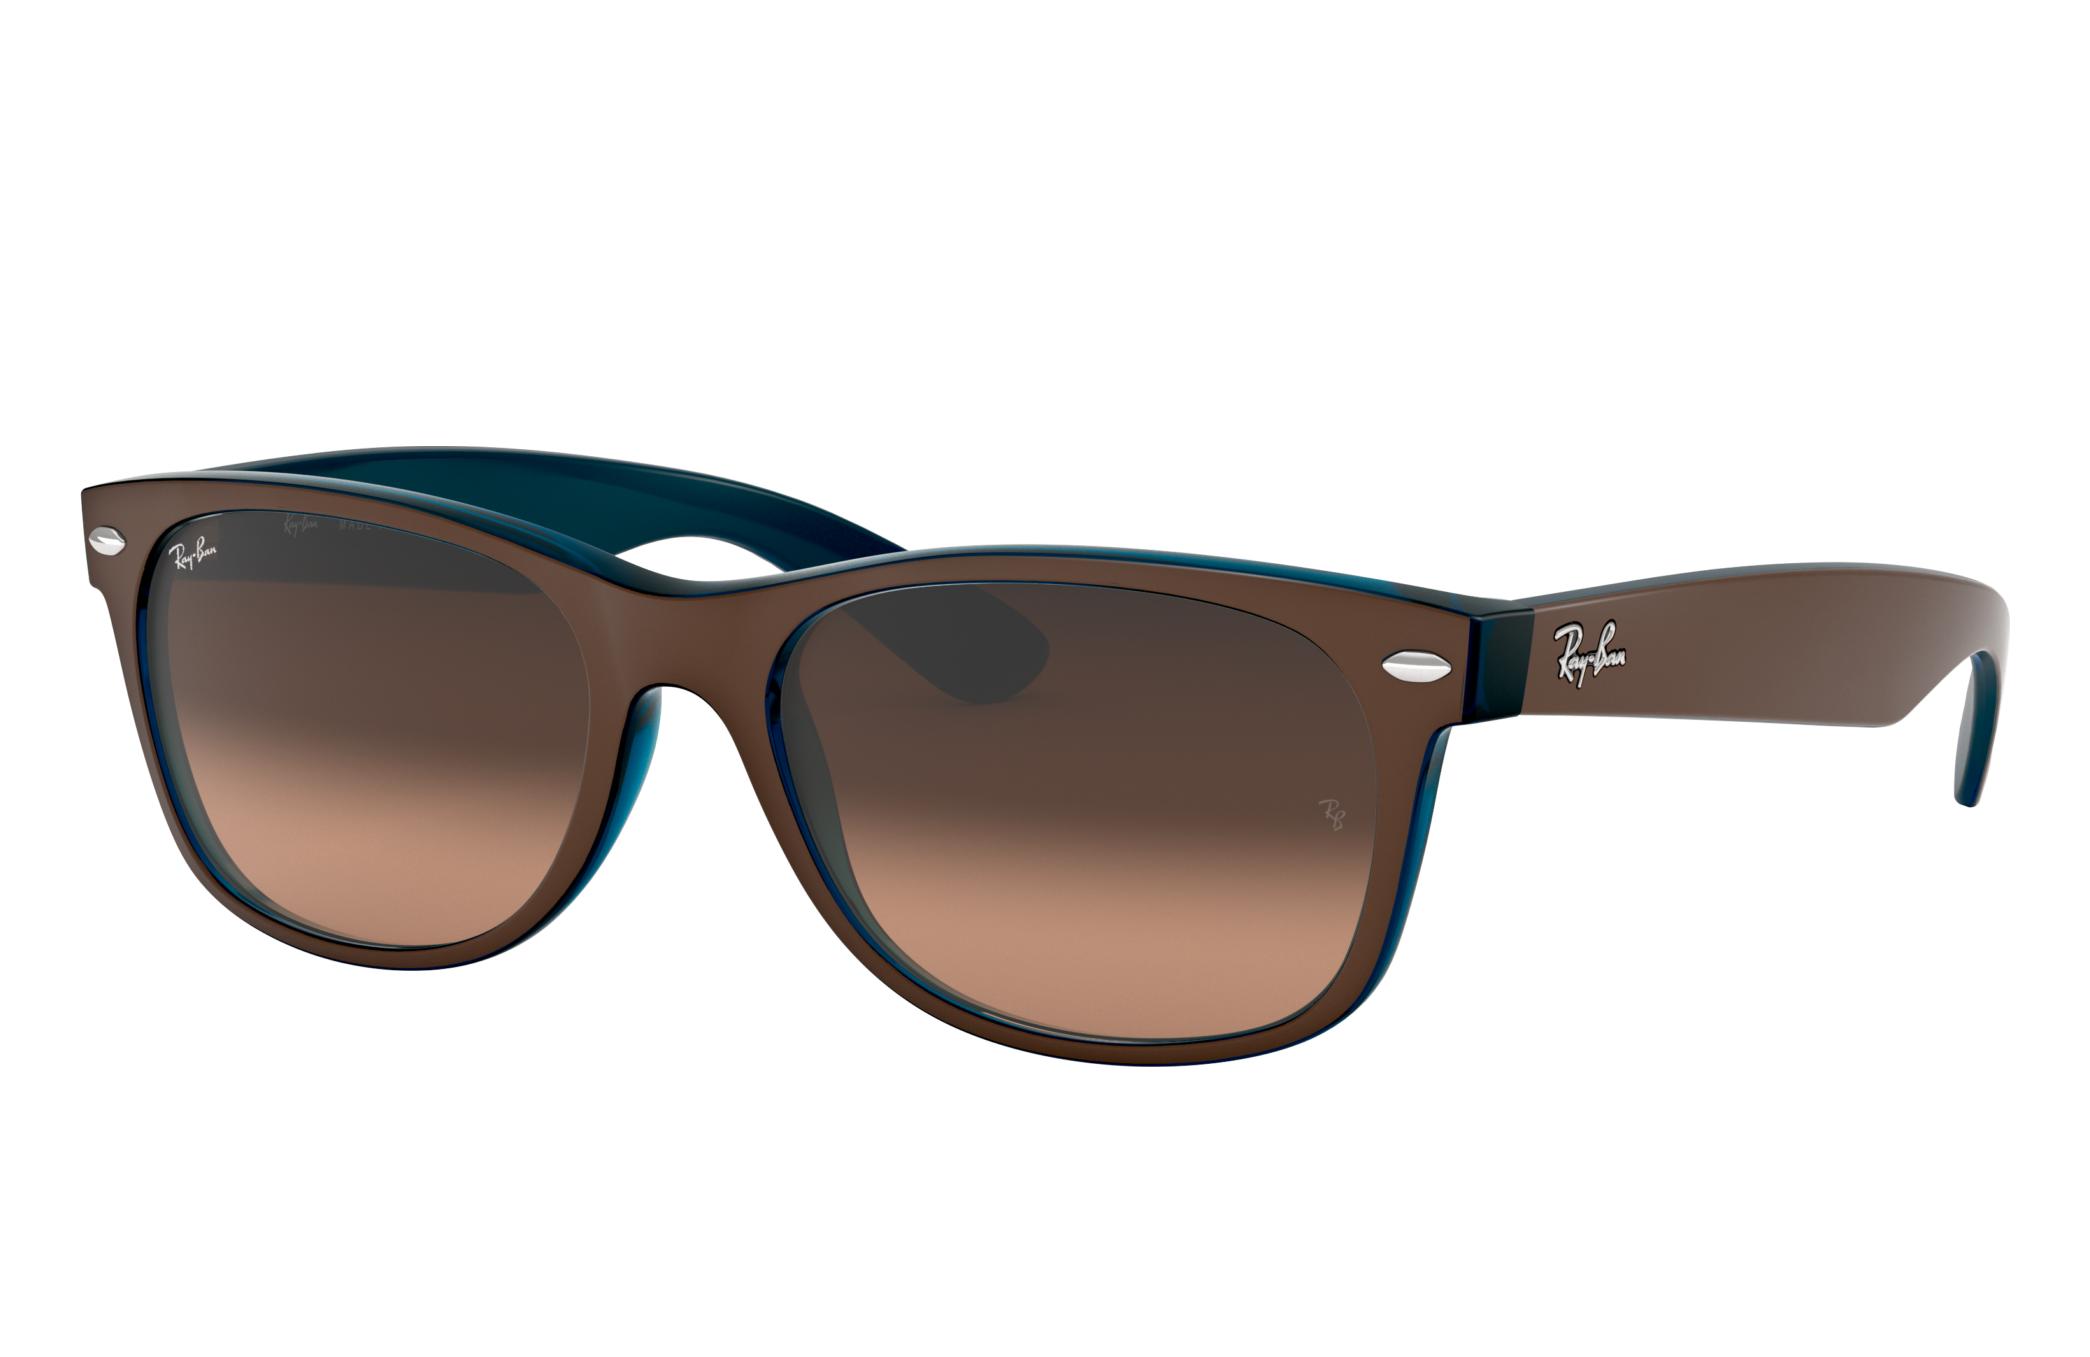 Ray-Ban New Wayfarer Color Mix Brown, Pink Lenses - RB2132